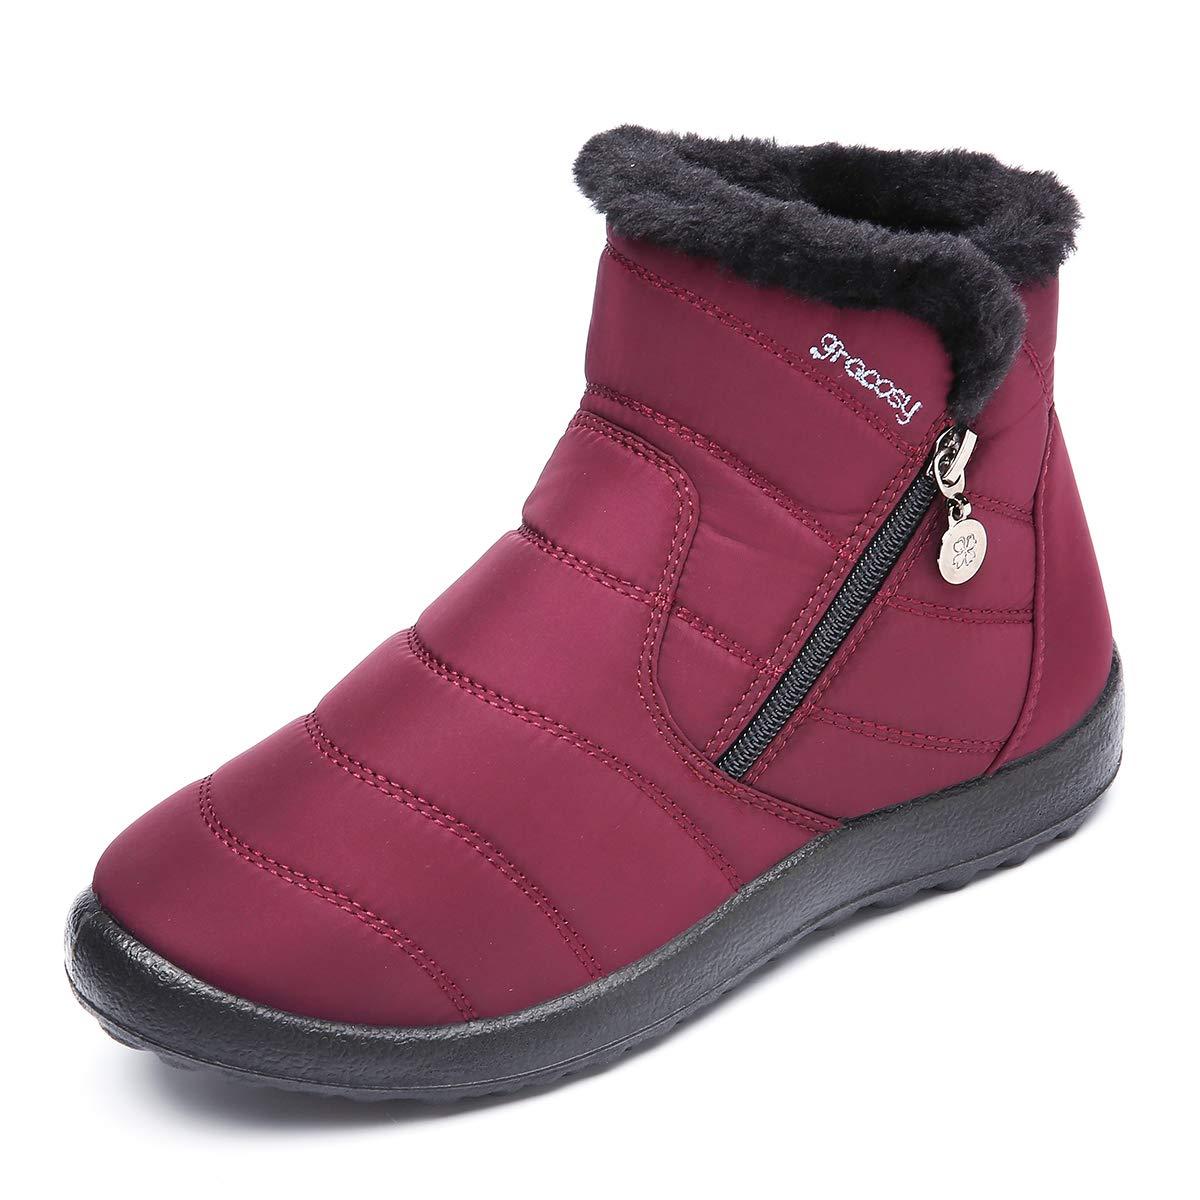 Gracosy - Botas de nieve cálidas para mujer, botines de invierno antideslizantes con forro de piel e impermeables para exteriores